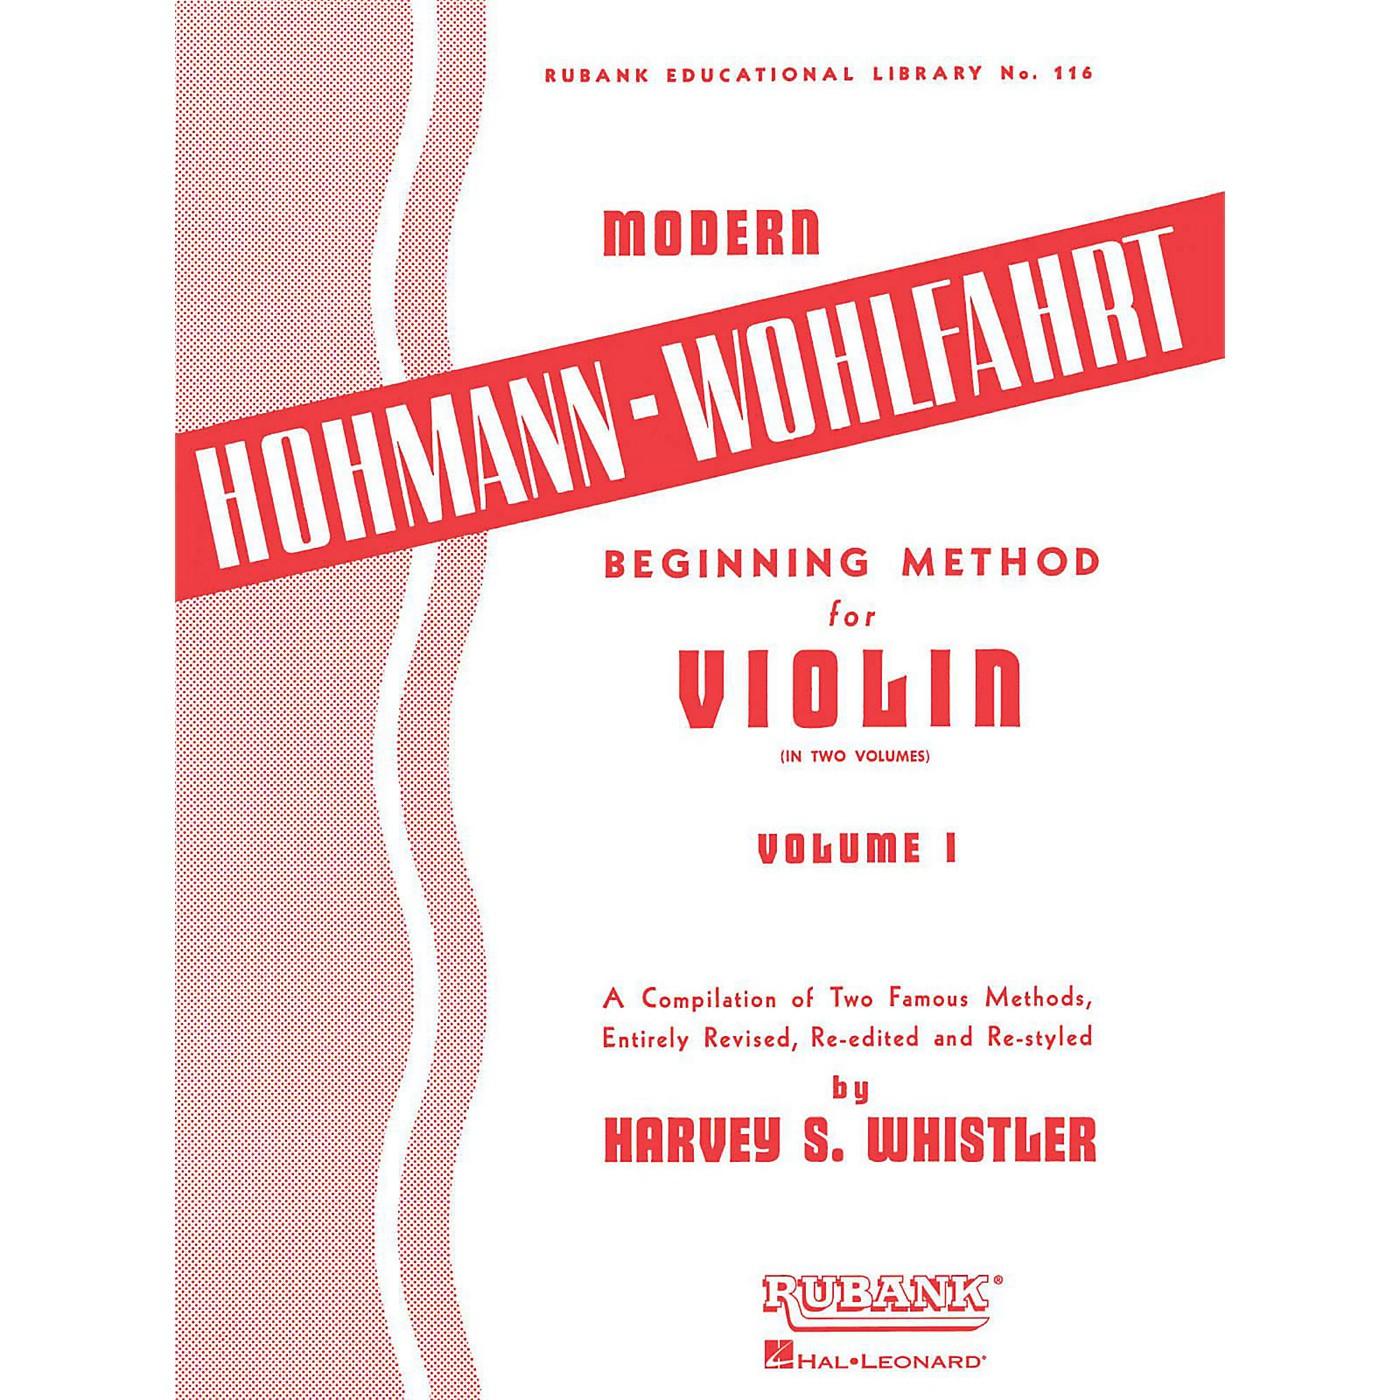 Hal Leonard Modern Hohmann-Wohlfahrt Beginning Method for Violin, Volume 1 thumbnail